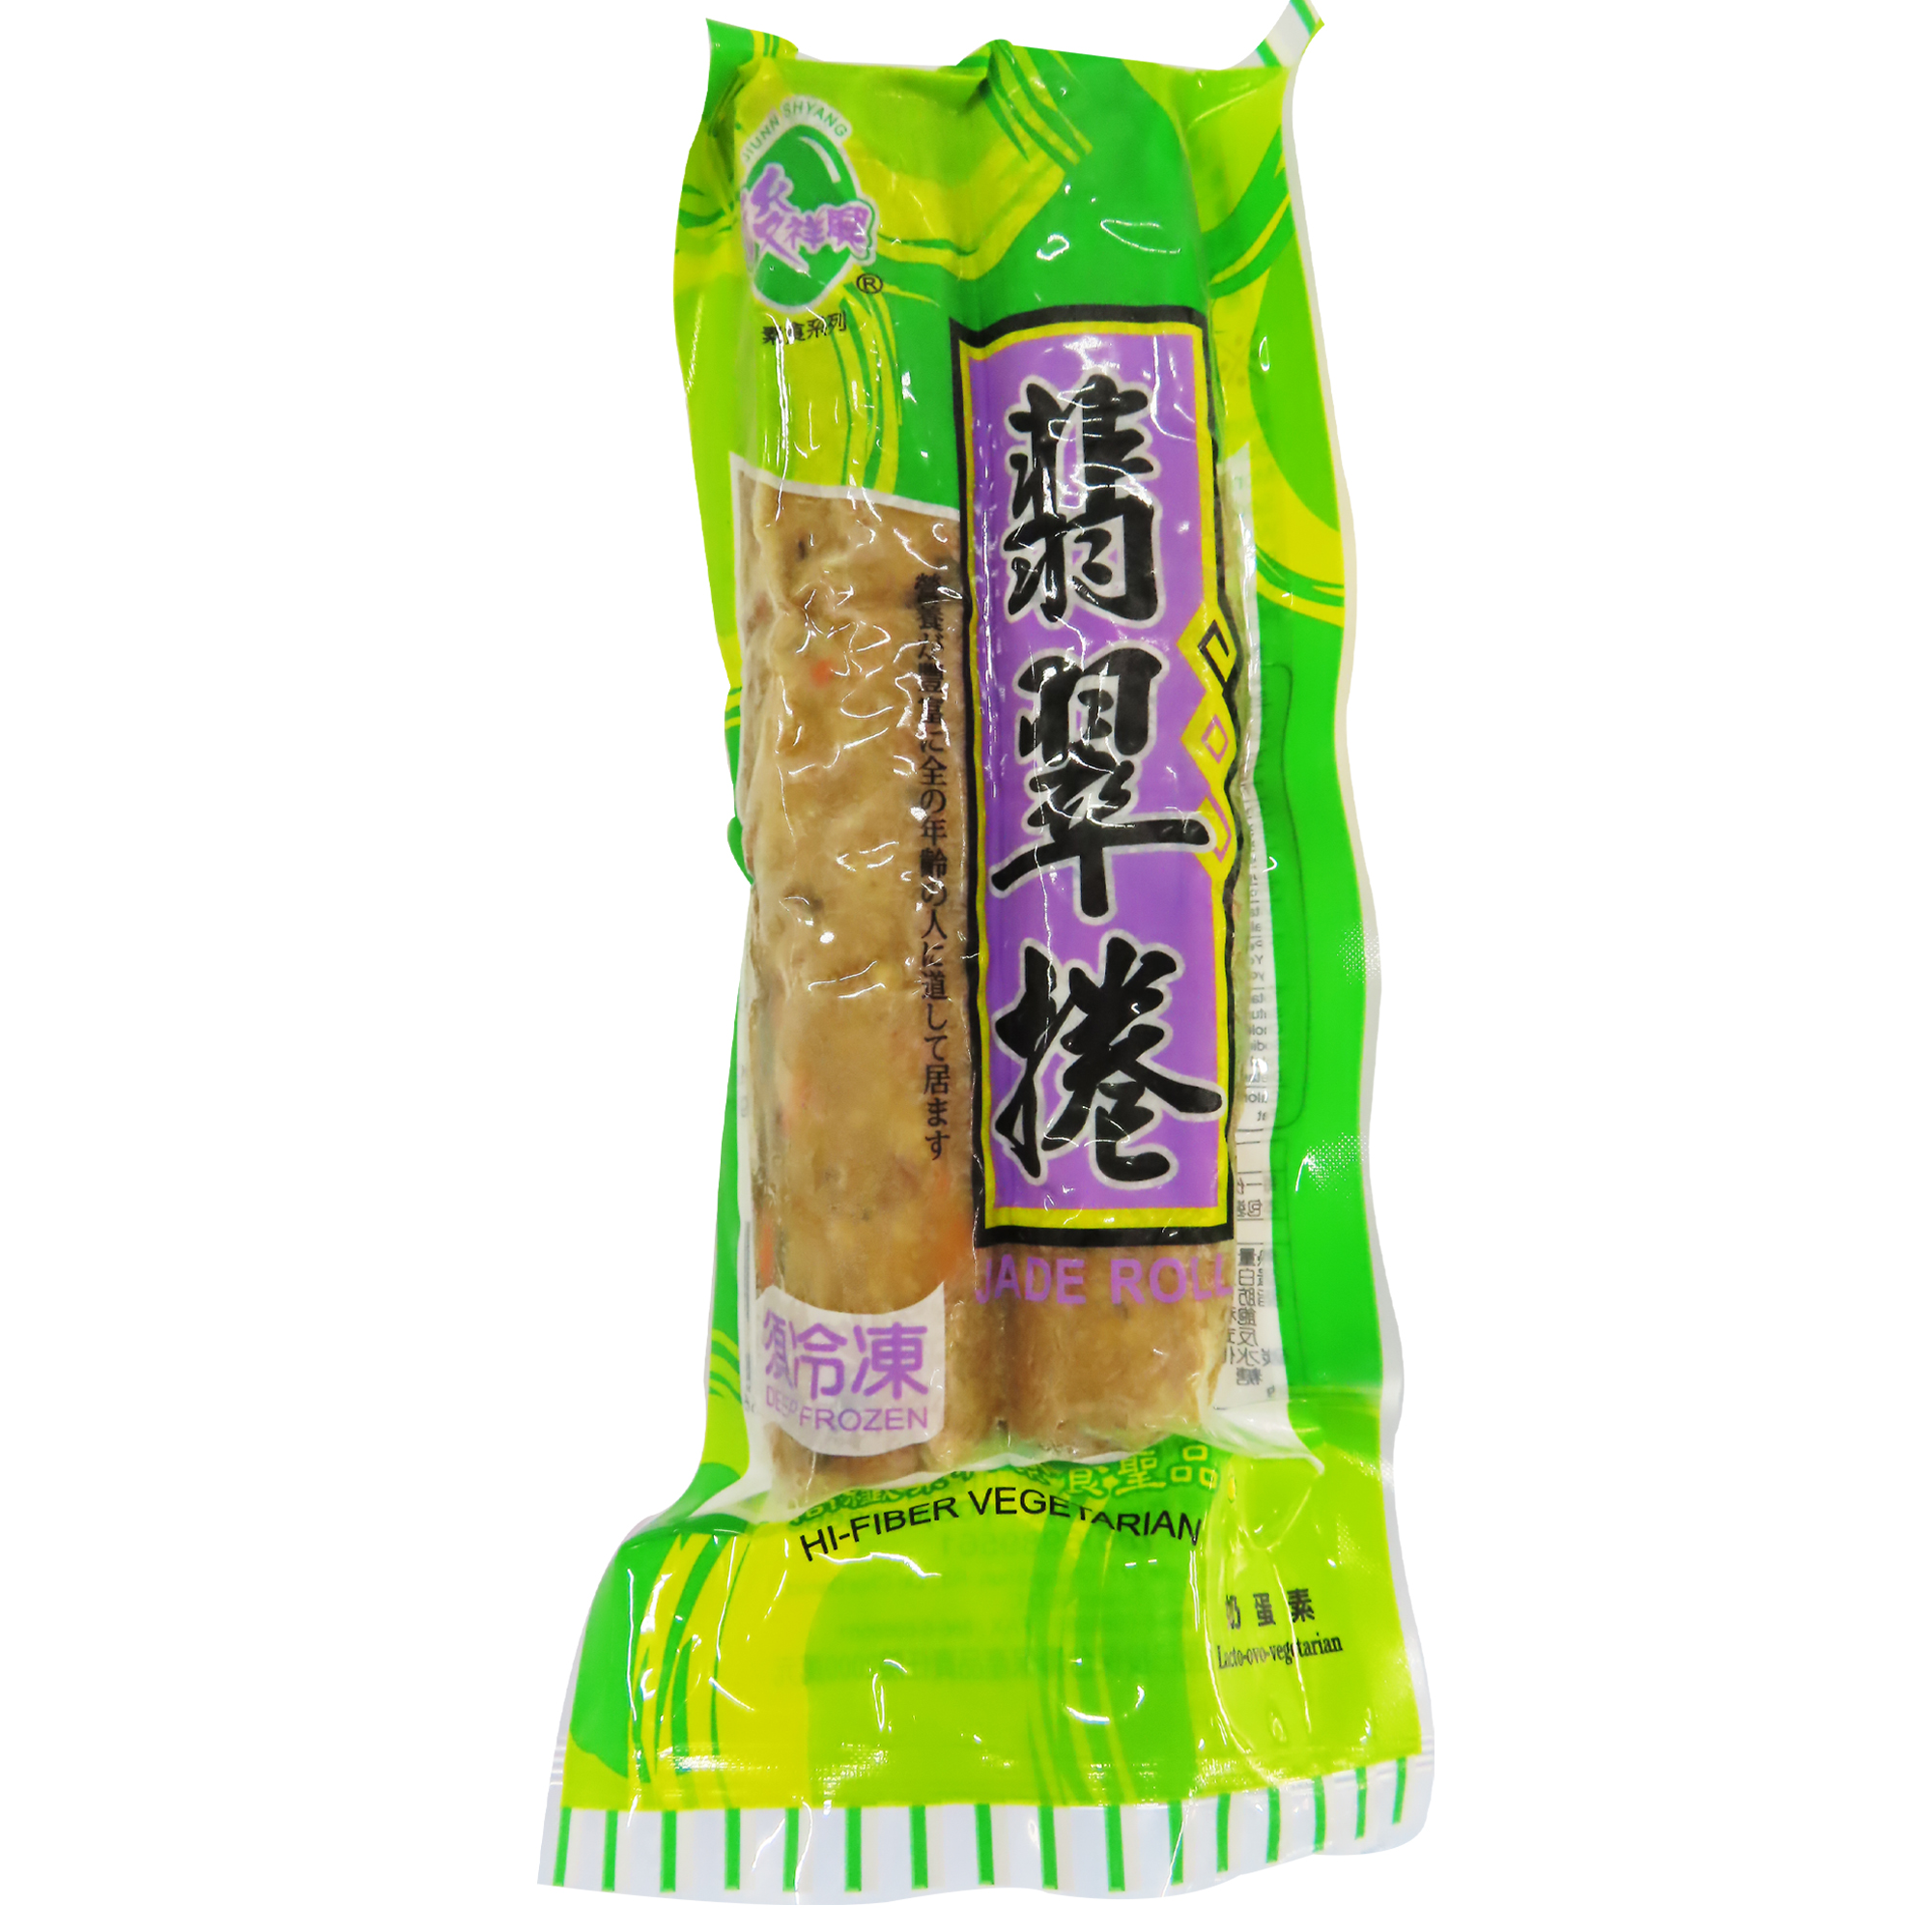 Image Jade Roll 竣祥兴-翡翠卷 (2 pieces) 300grams